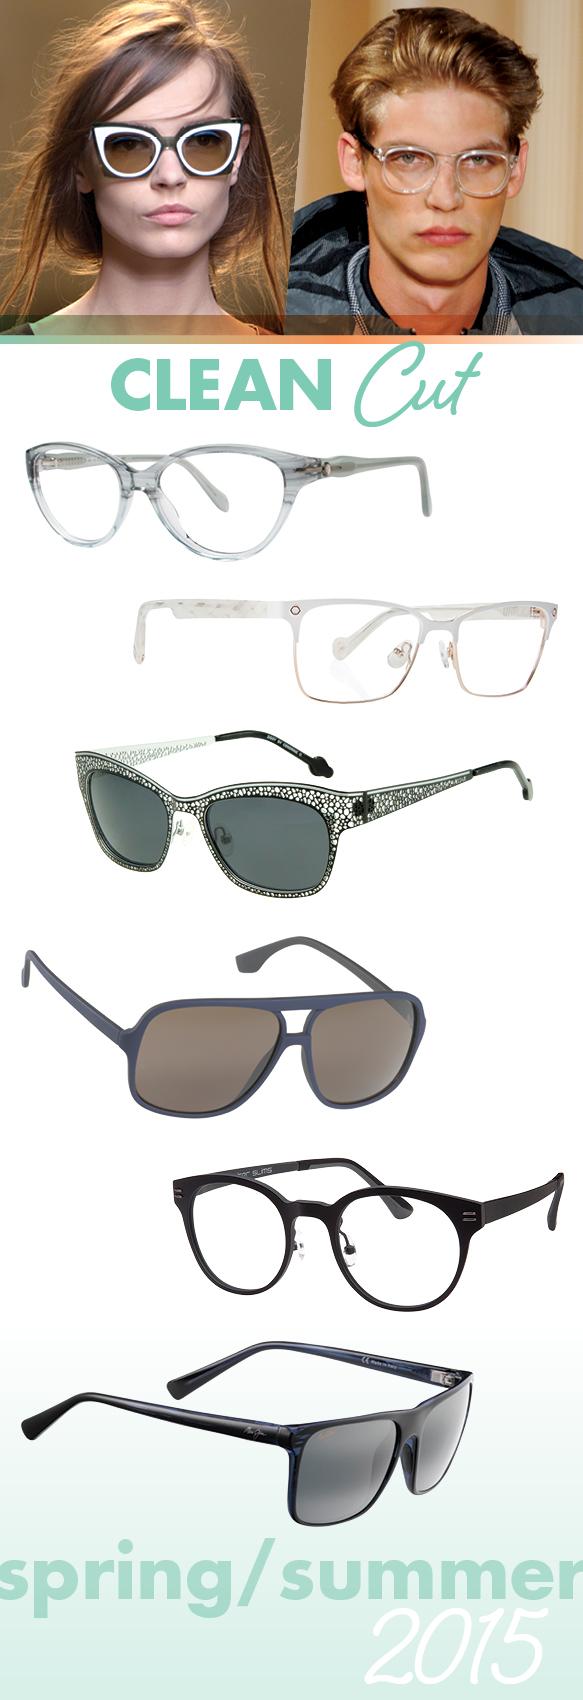 Leon Max (4018), Kingsley Rowe (Kennedy), ZIGGY by Cendrine O. (Sunny 101), ICU Eyewear (7477), Jupiter Slims (Solar), Maui Jim (Flat Island)